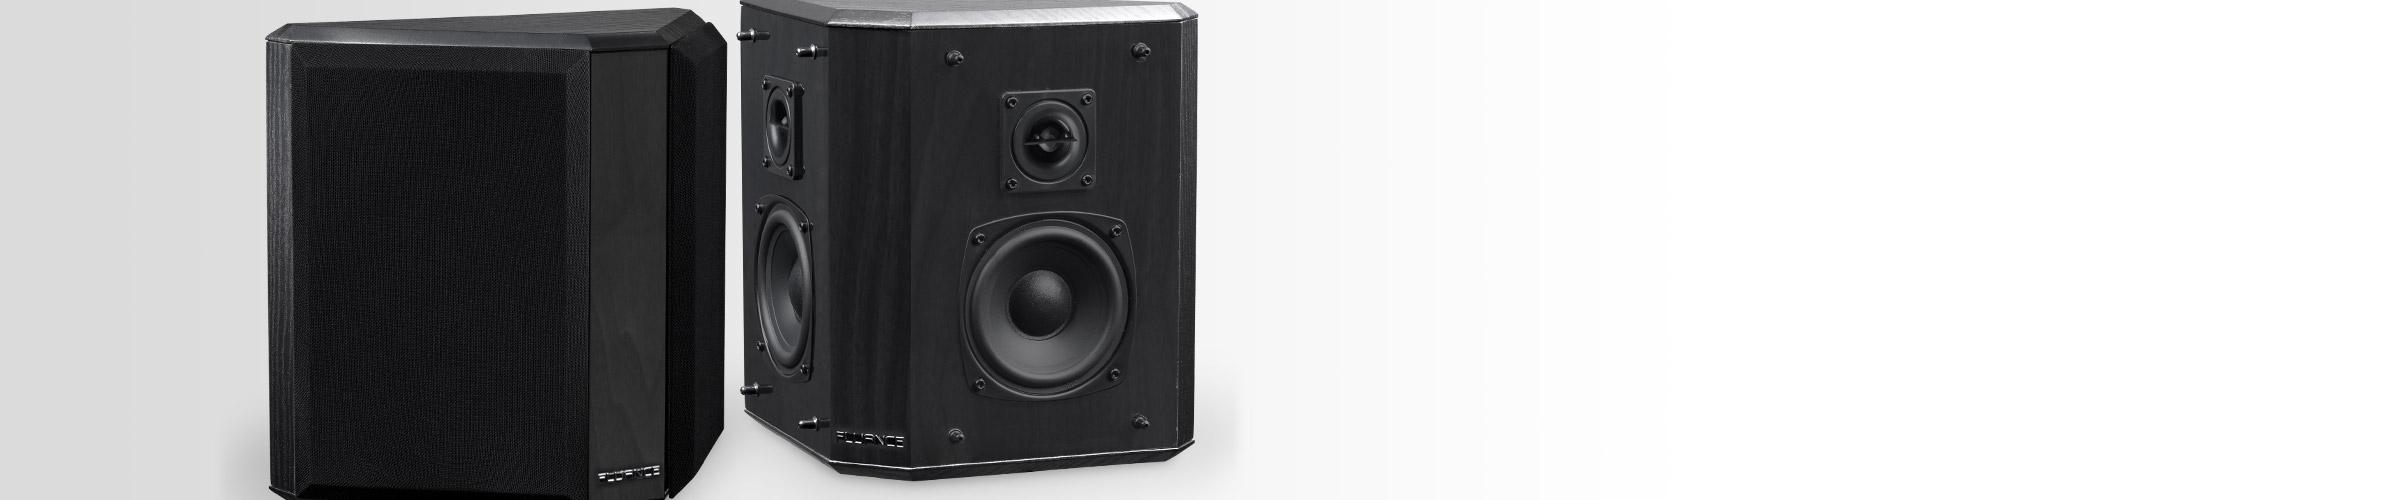 SXBP2 Bipolar Surround Sound Speakers wide dispersion